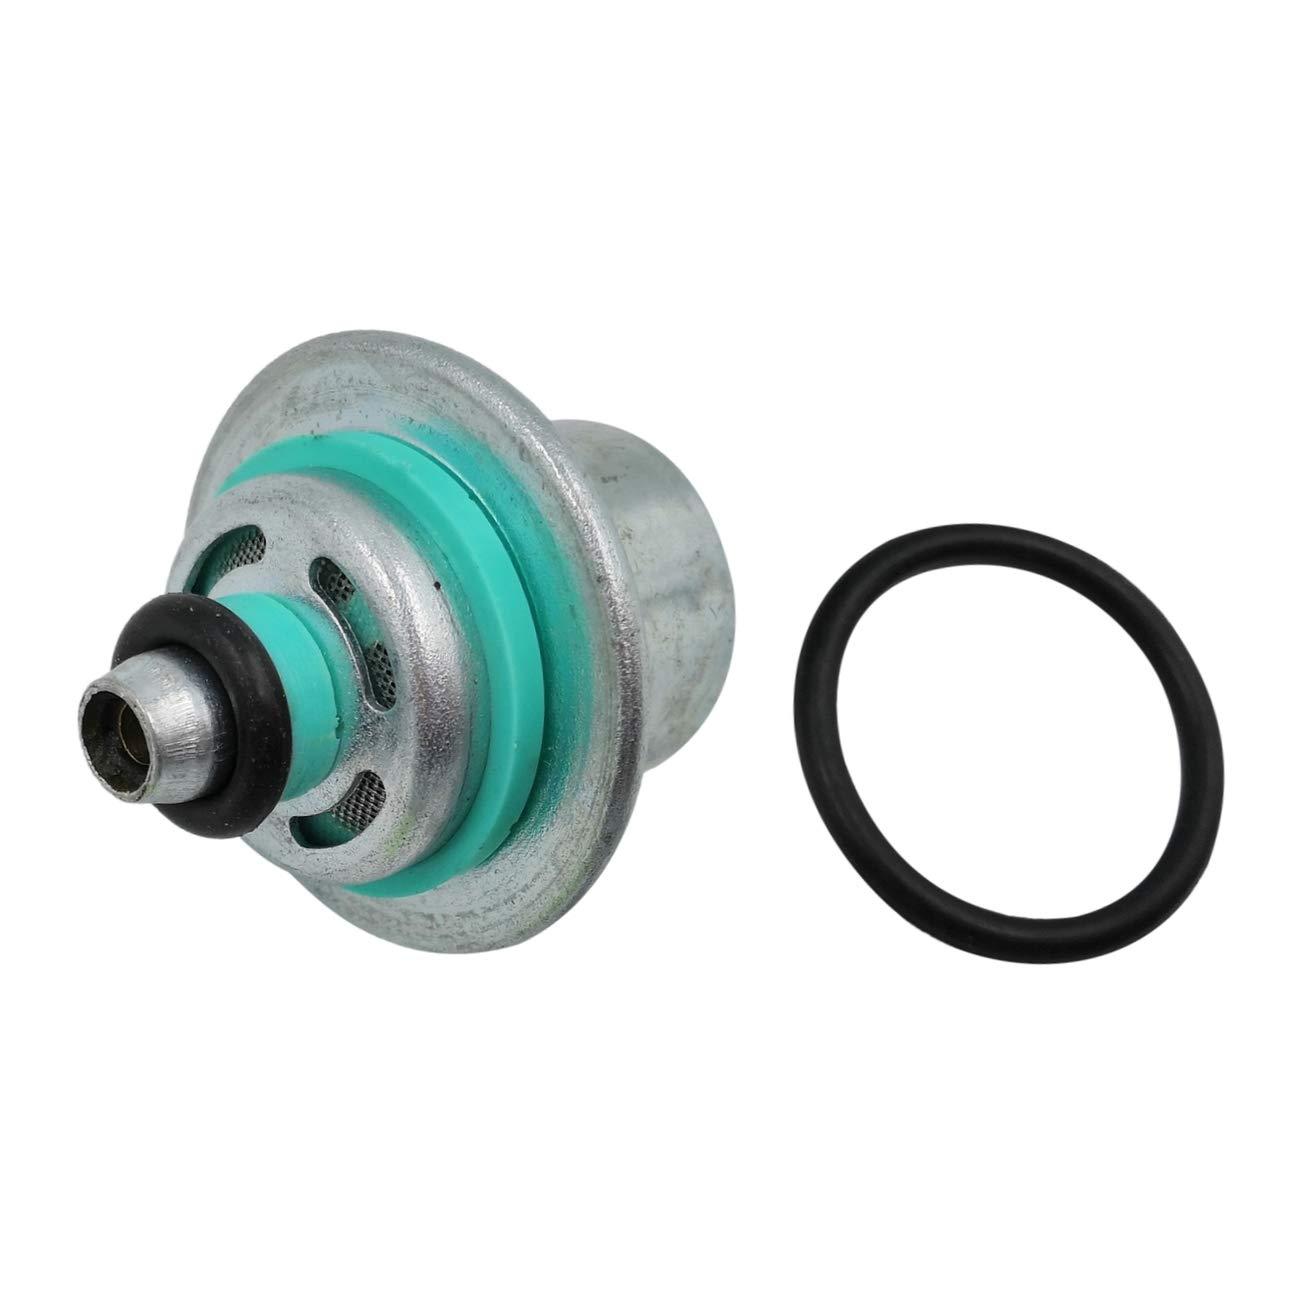 SKP SKPR456 Fuel Pressure Regulator